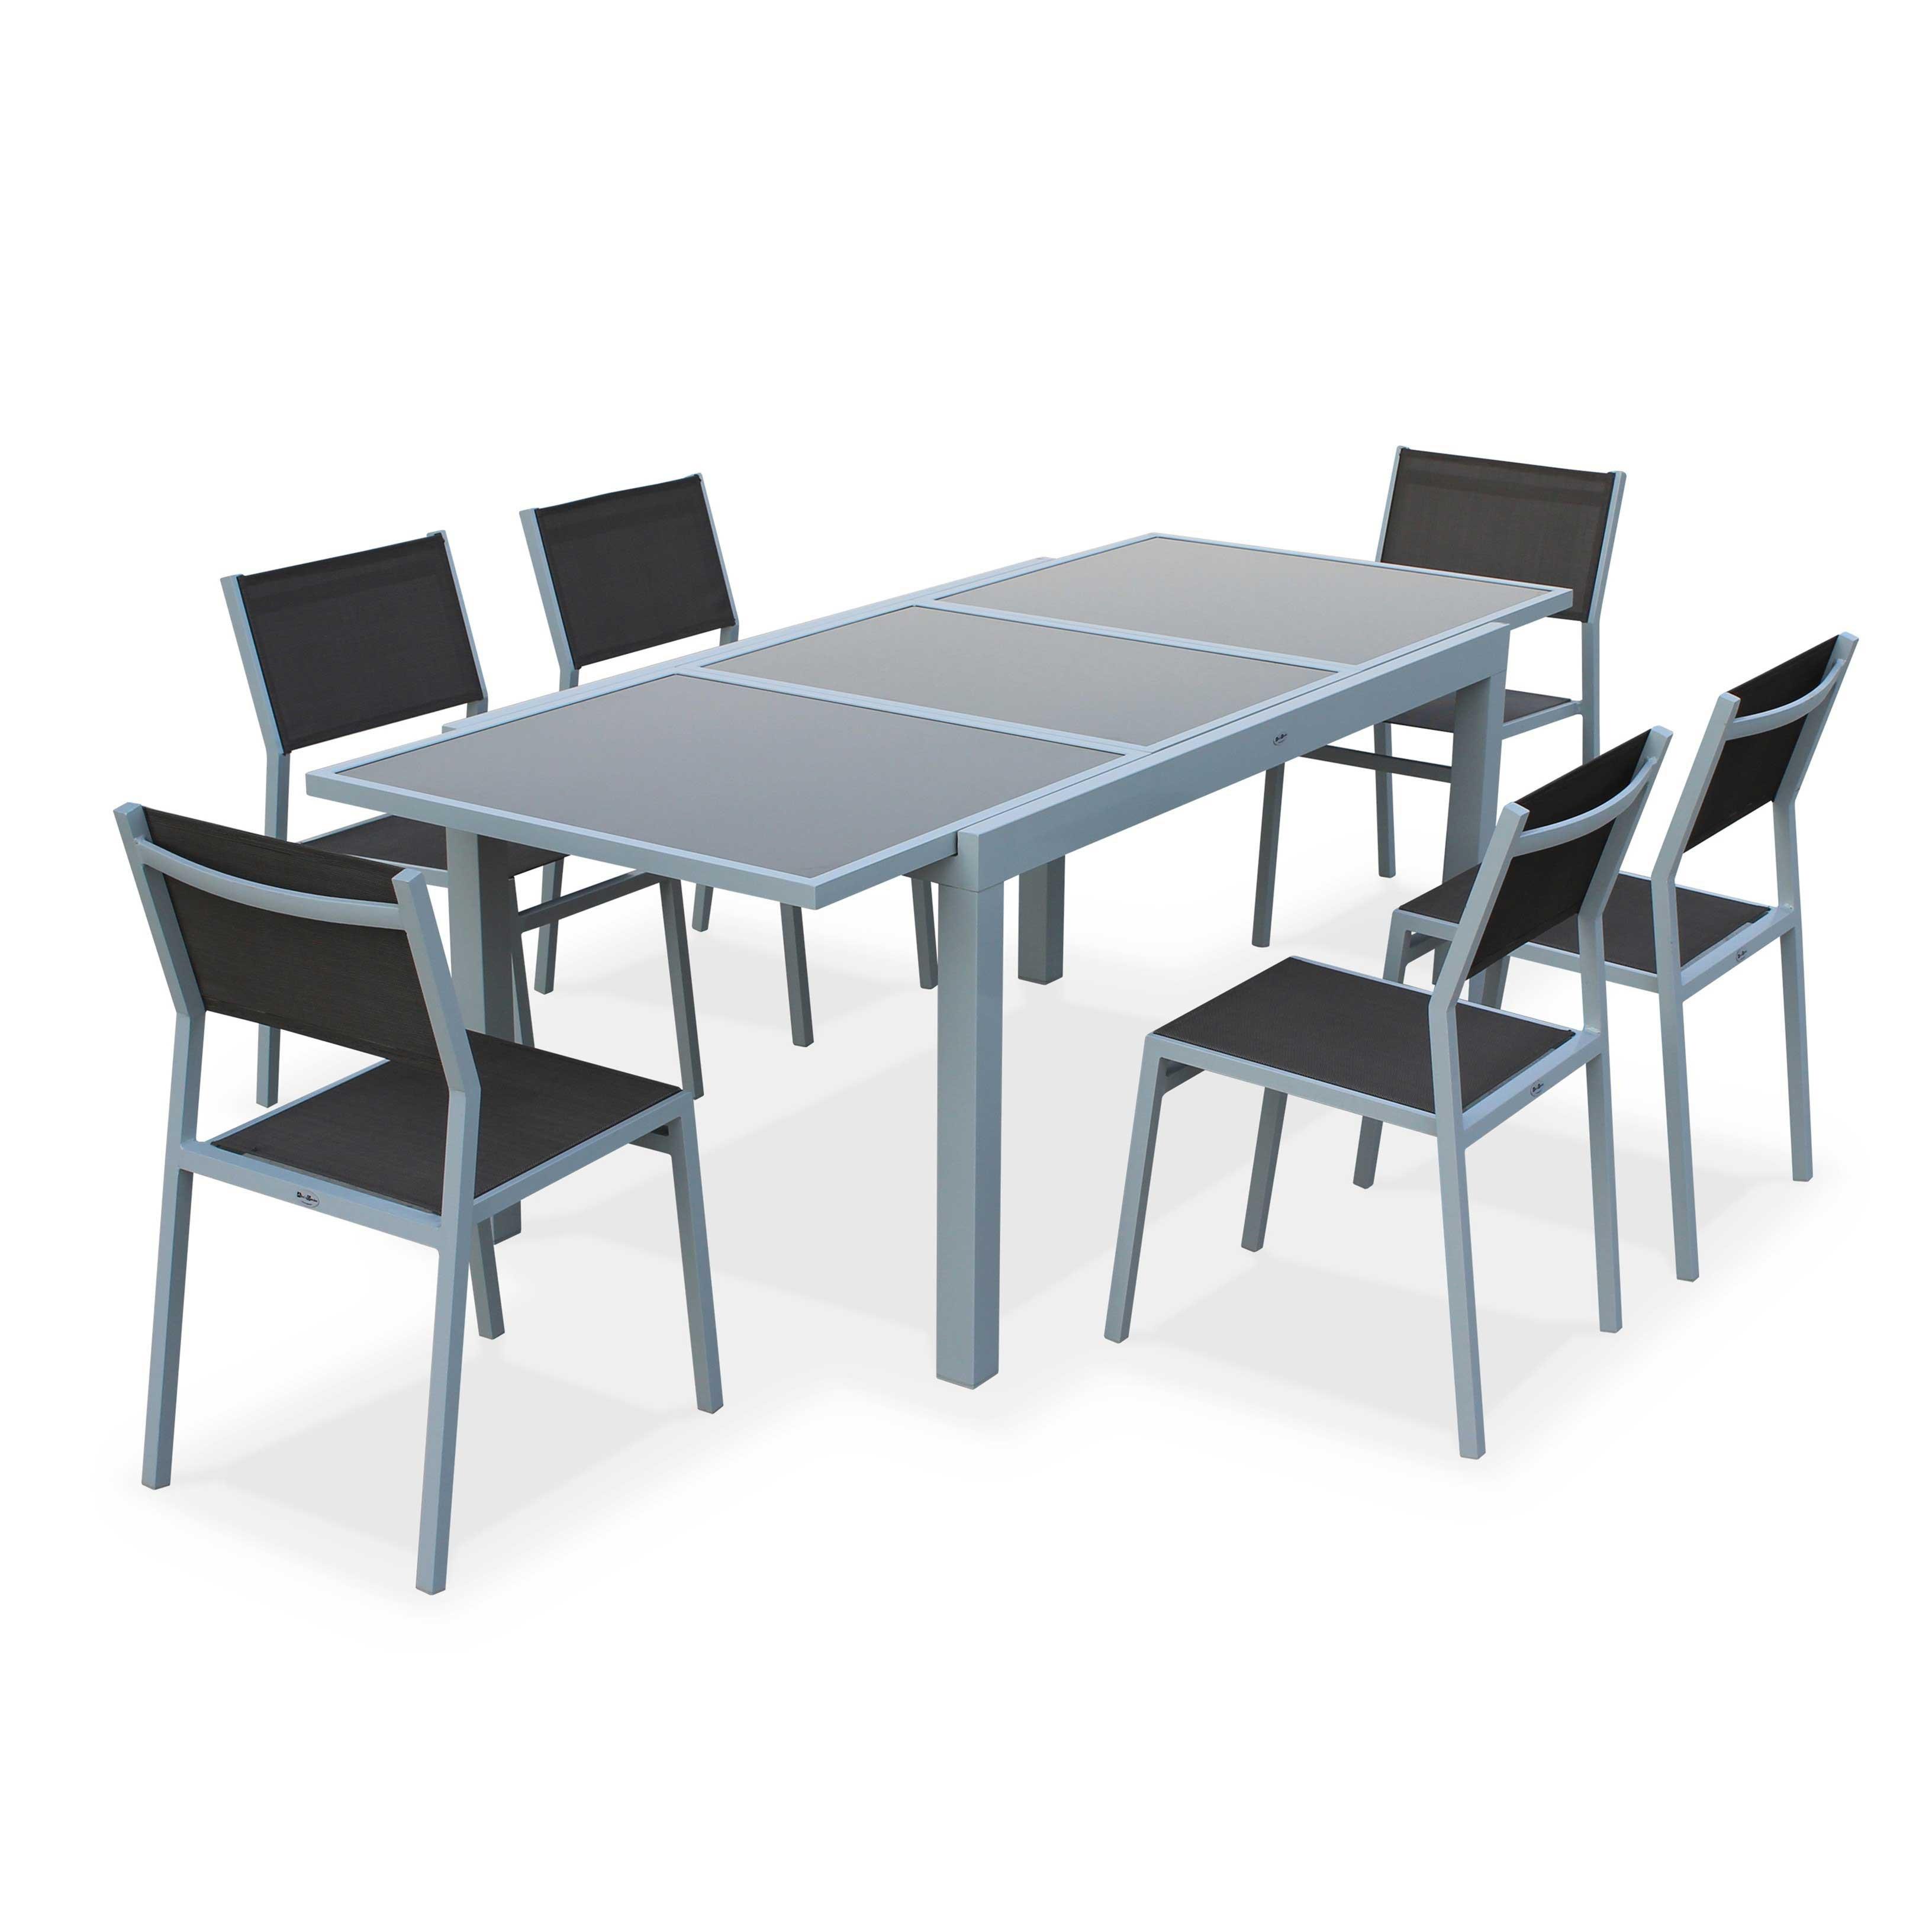 Table Camping Pliante Leclerc Frais Photos Table Pliante Leclerc Luxe Table Jardin Pas Cher Salon De Jardin